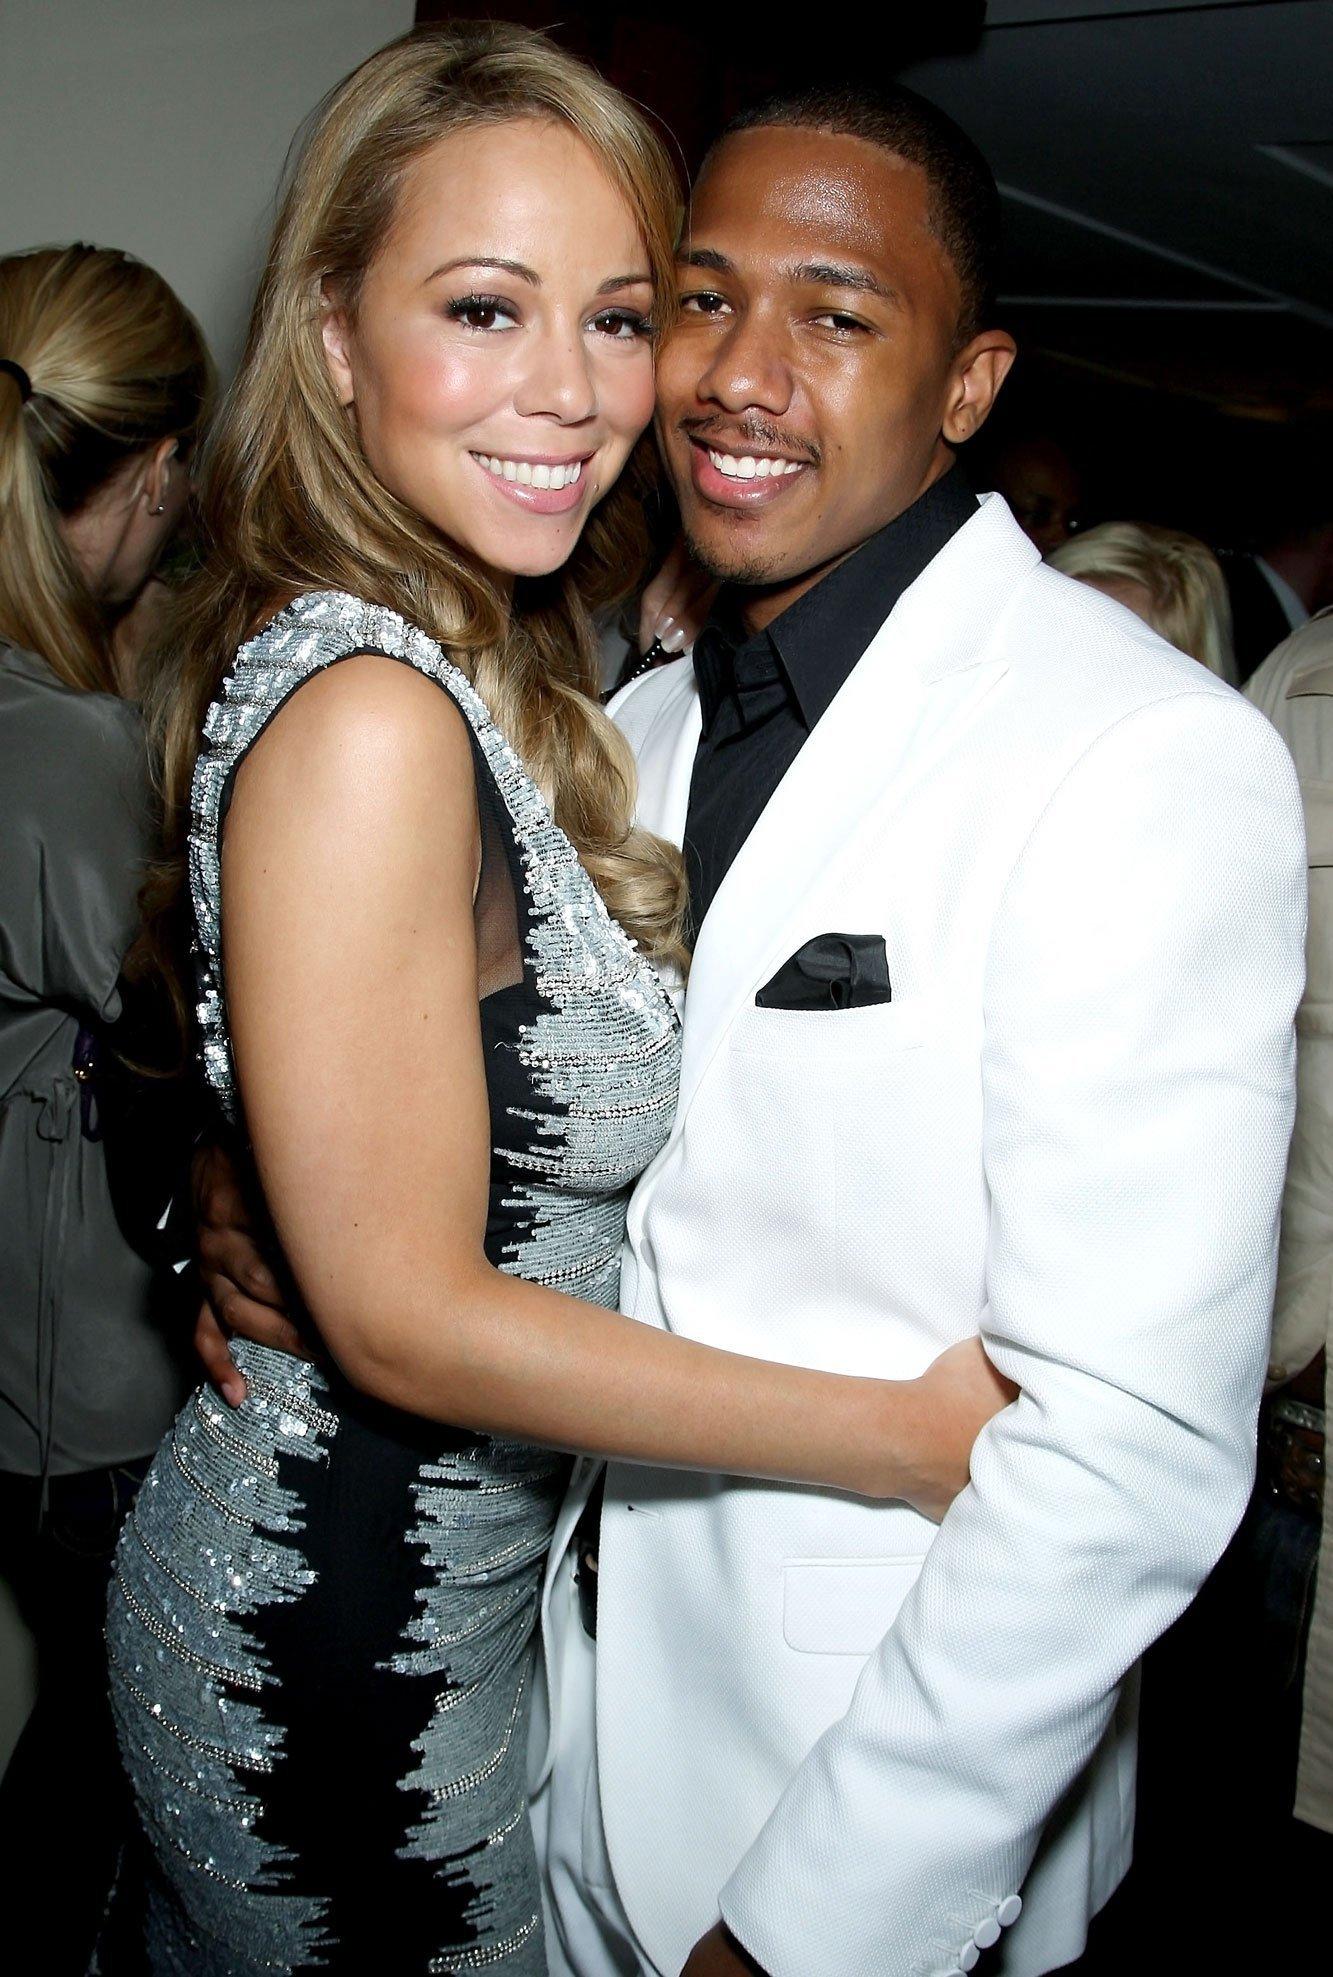 Mariah-Carey-Nick-Cannon-The-Way-They-Were-Landing.jpg